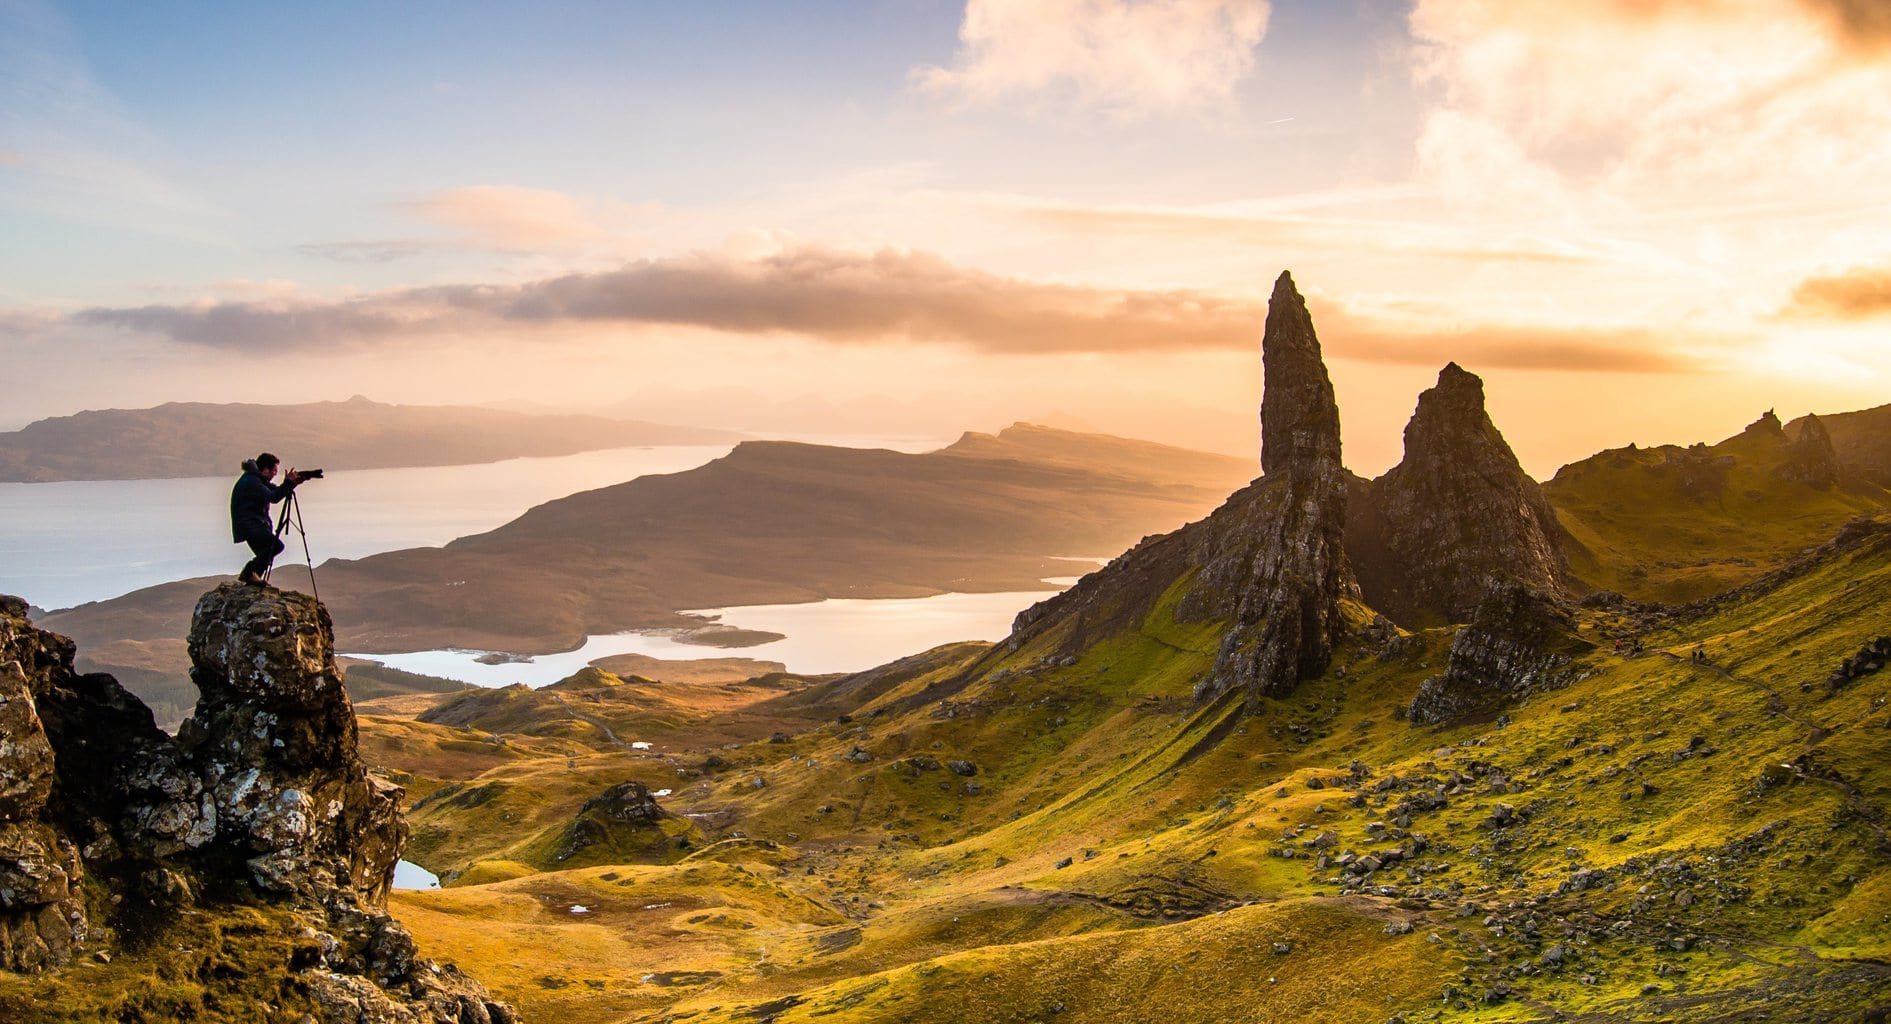 Fotógrafo capturando un paisaje increíble